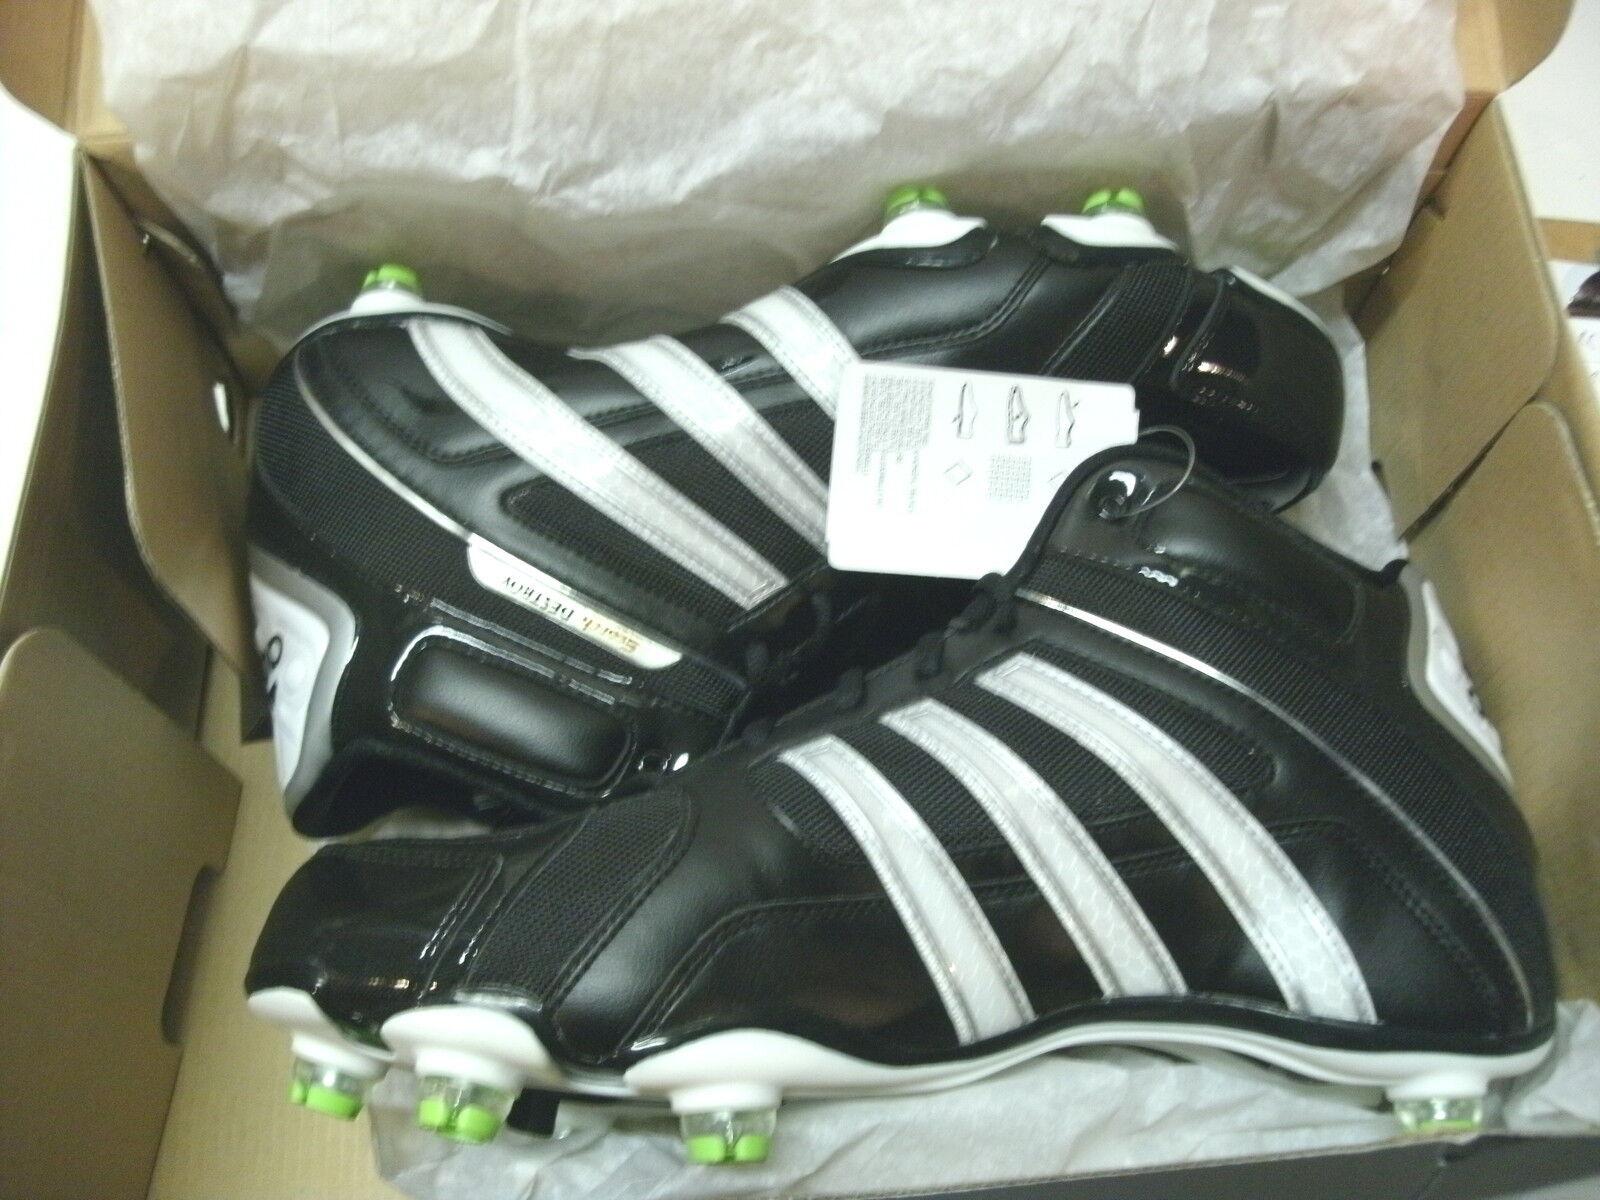 Adidas Scorch destruir D Mid Hombre football soccer 1 lacrosse cleats, tamaño 12 1 soccer / 2 Venta de liquidacion de temporada 4e7089